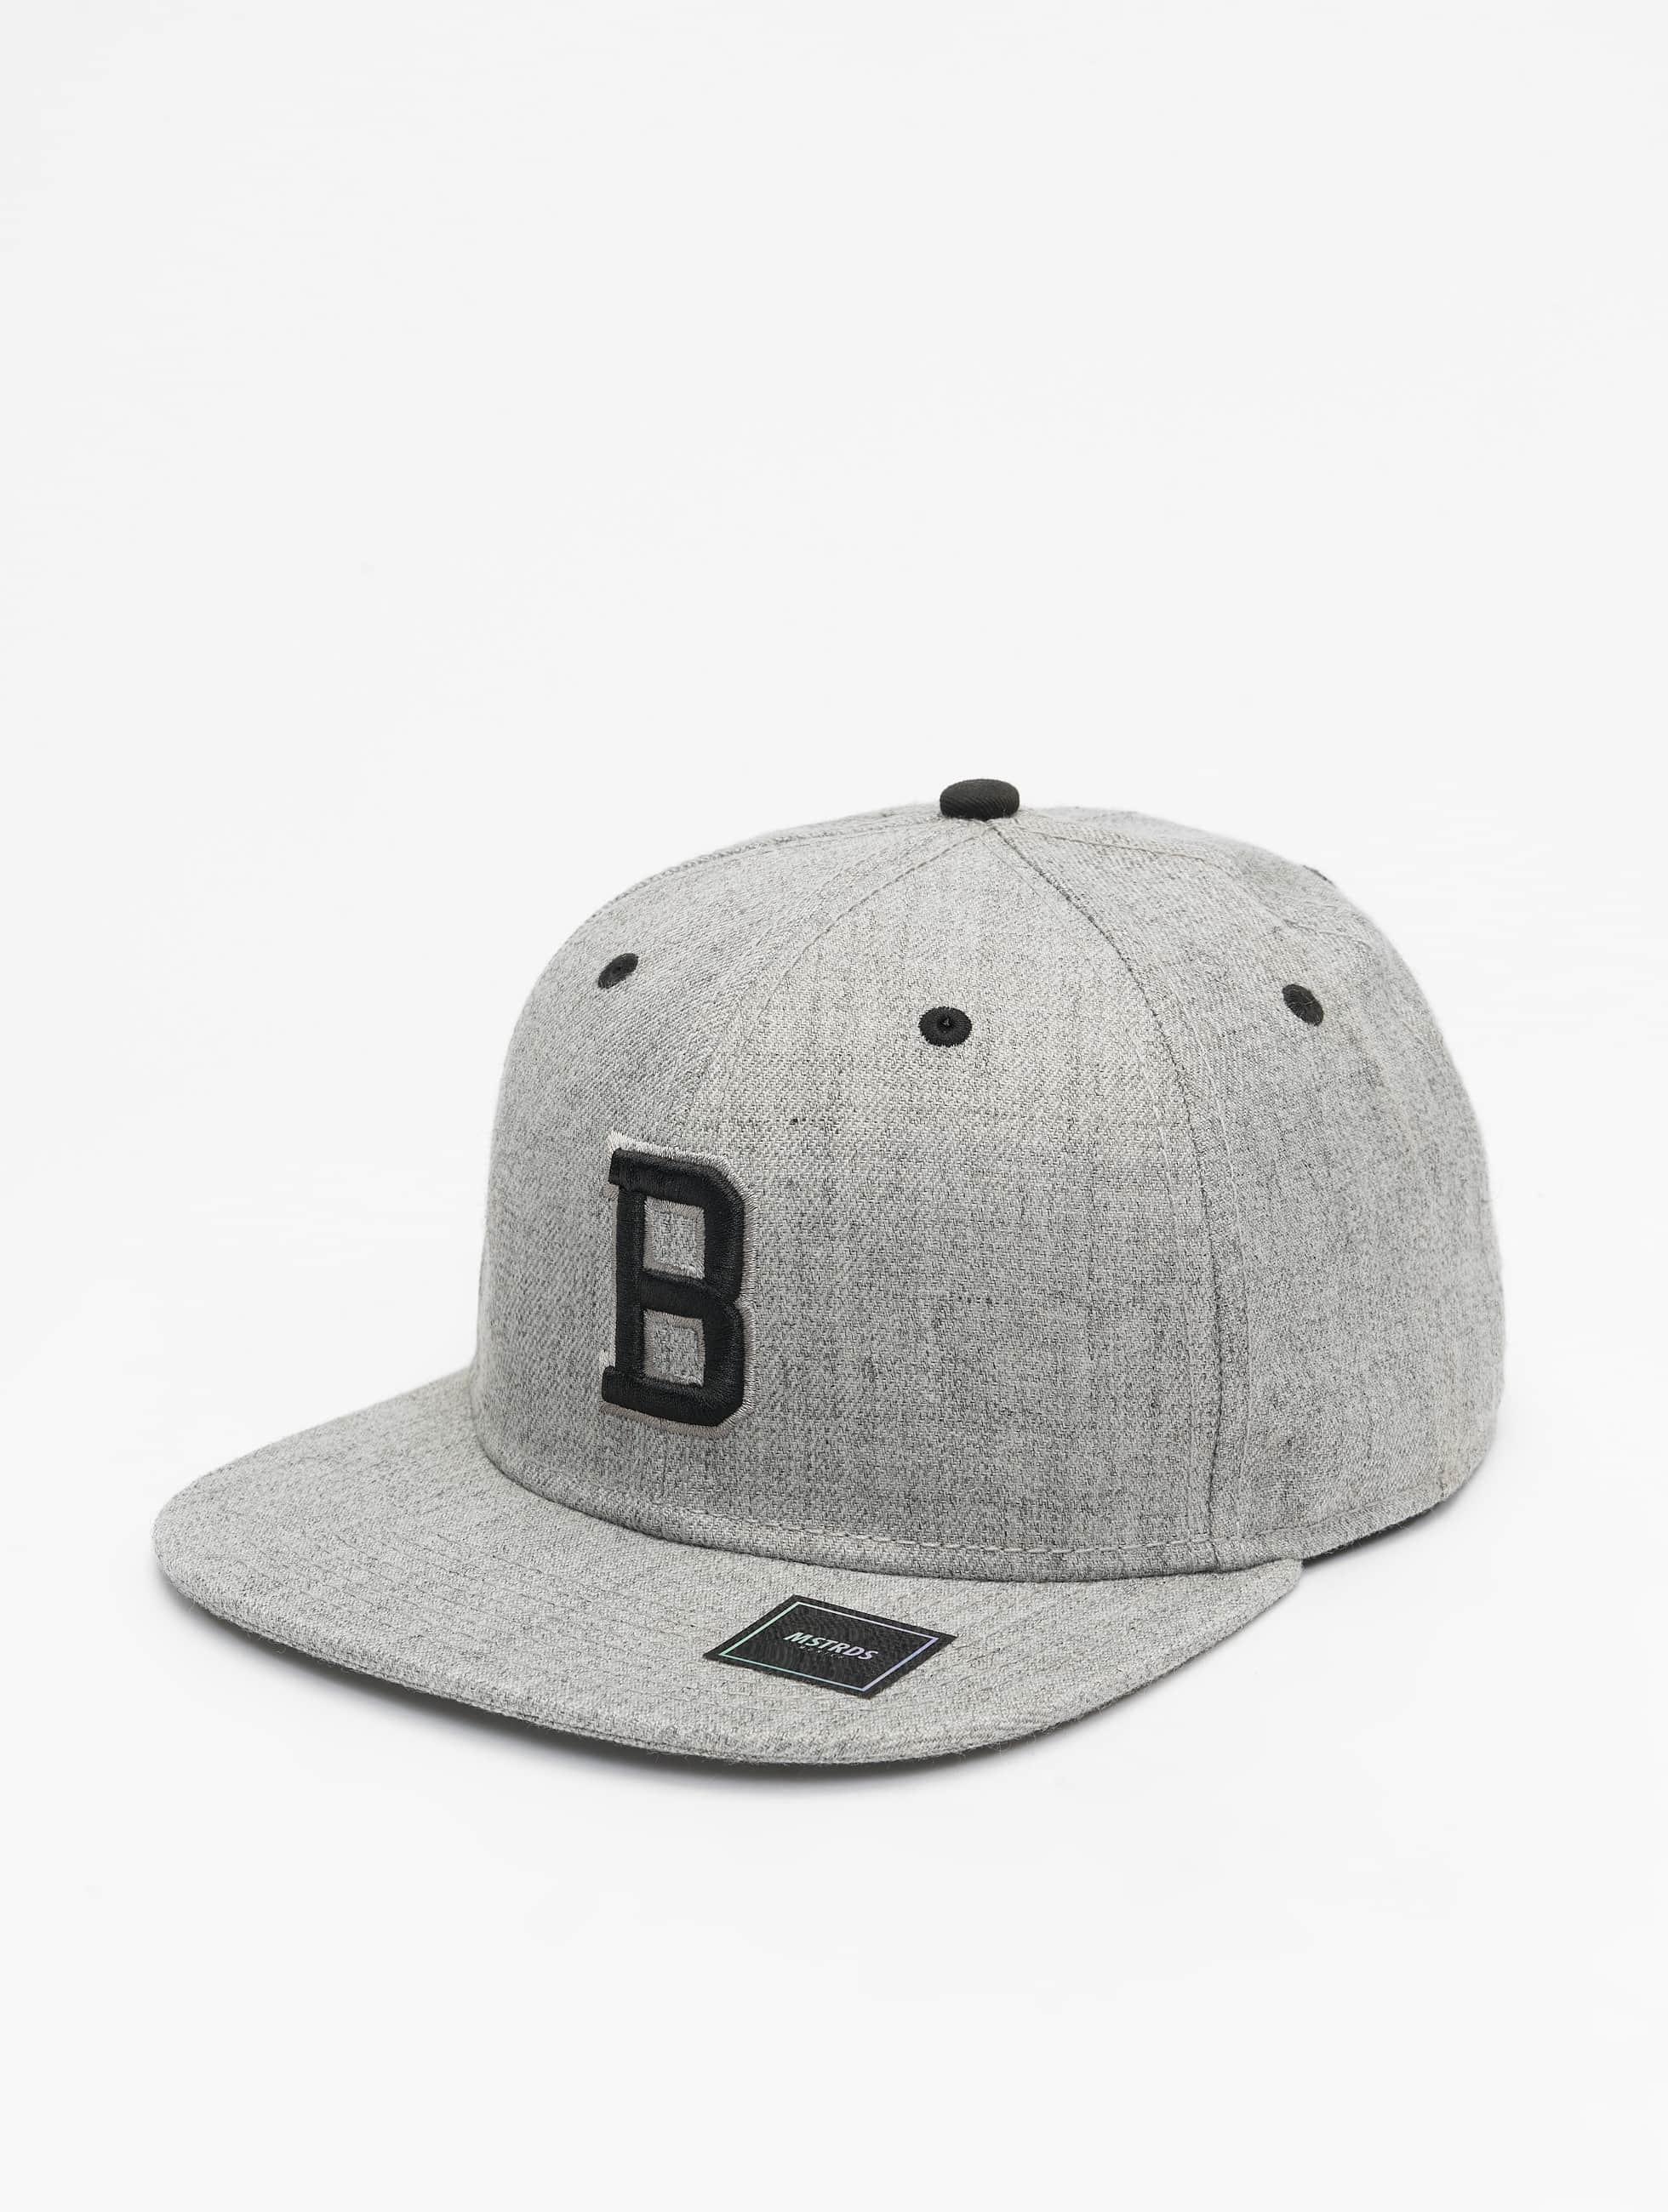 MSTRDS snapback cap B Letter grijs